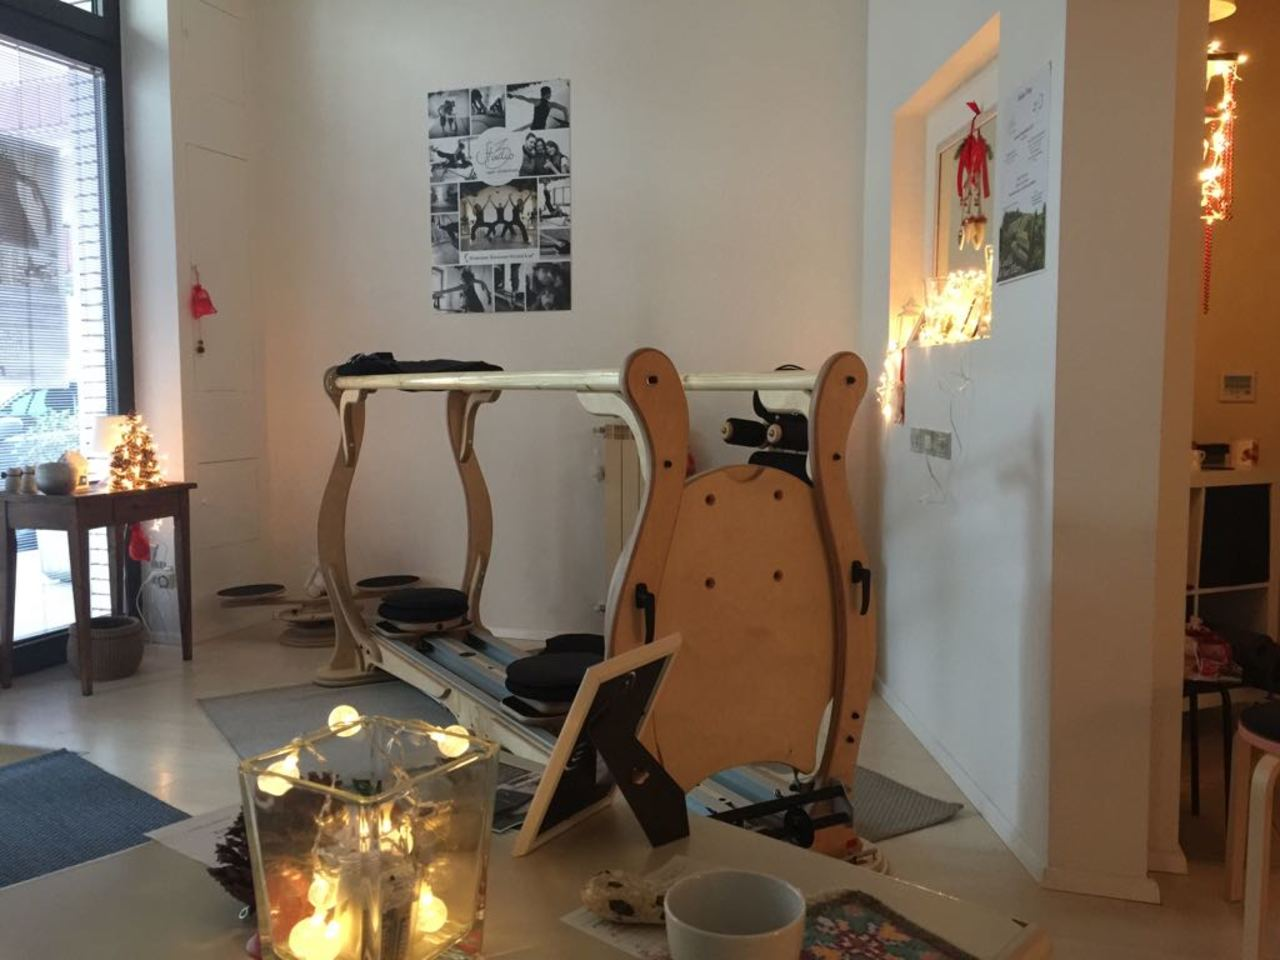 Studio3 New Directions GYROKINESIS Prato